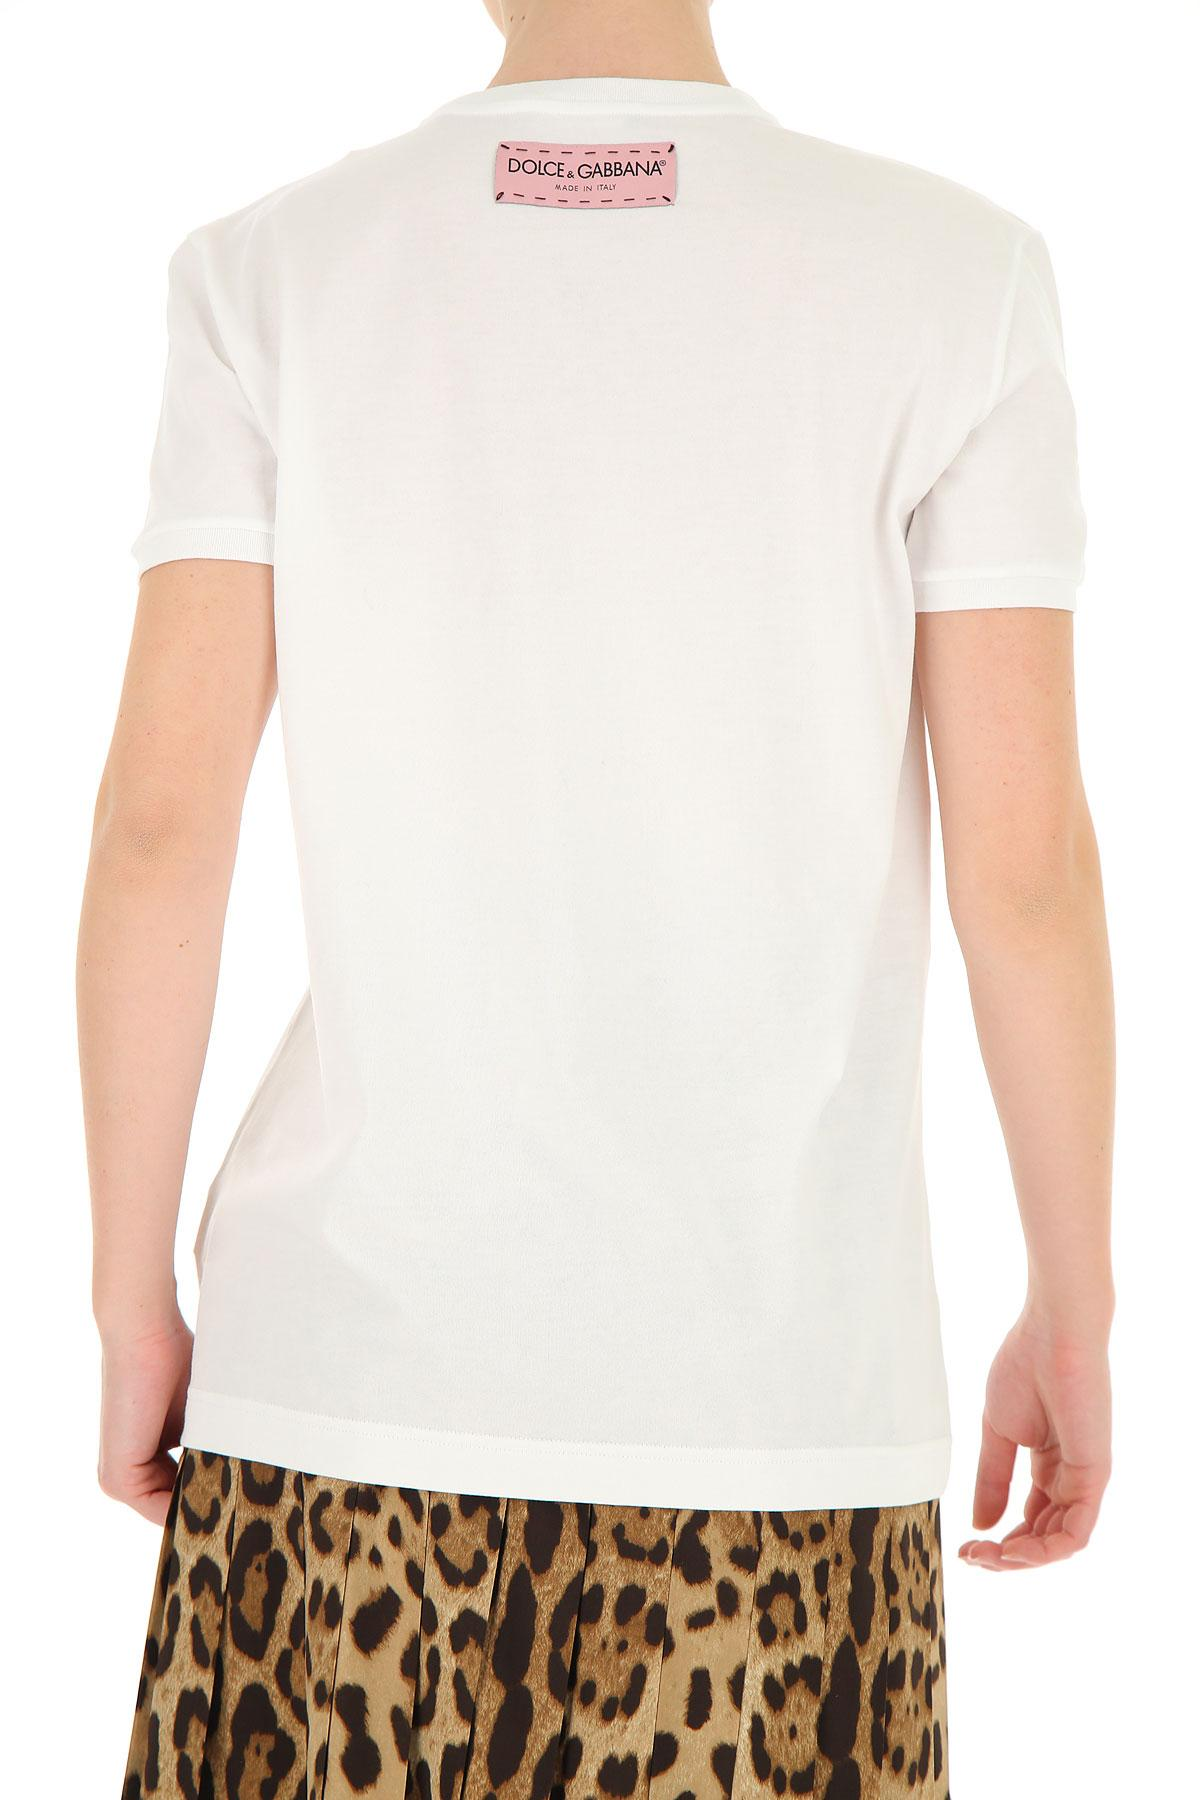 0937b6b31a9 Dolce   Gabbana - White T-shirt For Women - Lyst. View fullscreen